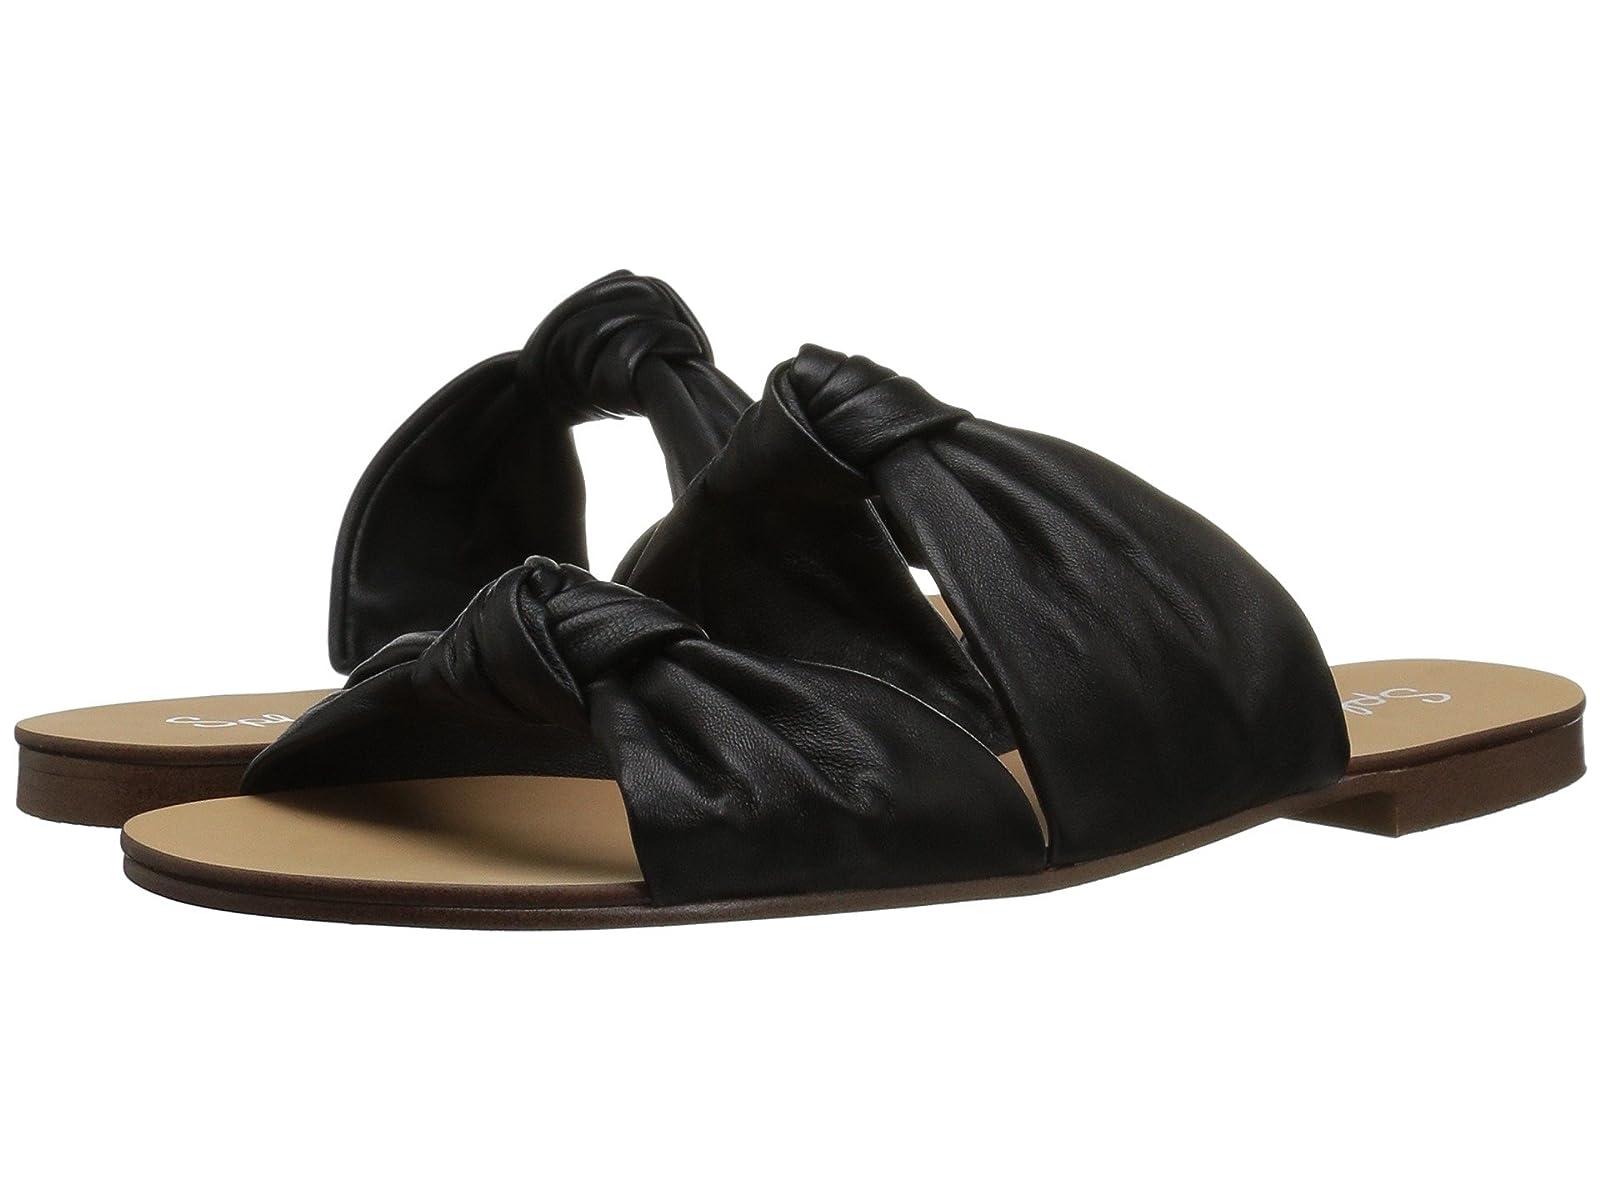 Splendid BartonCheap and distinctive eye-catching shoes